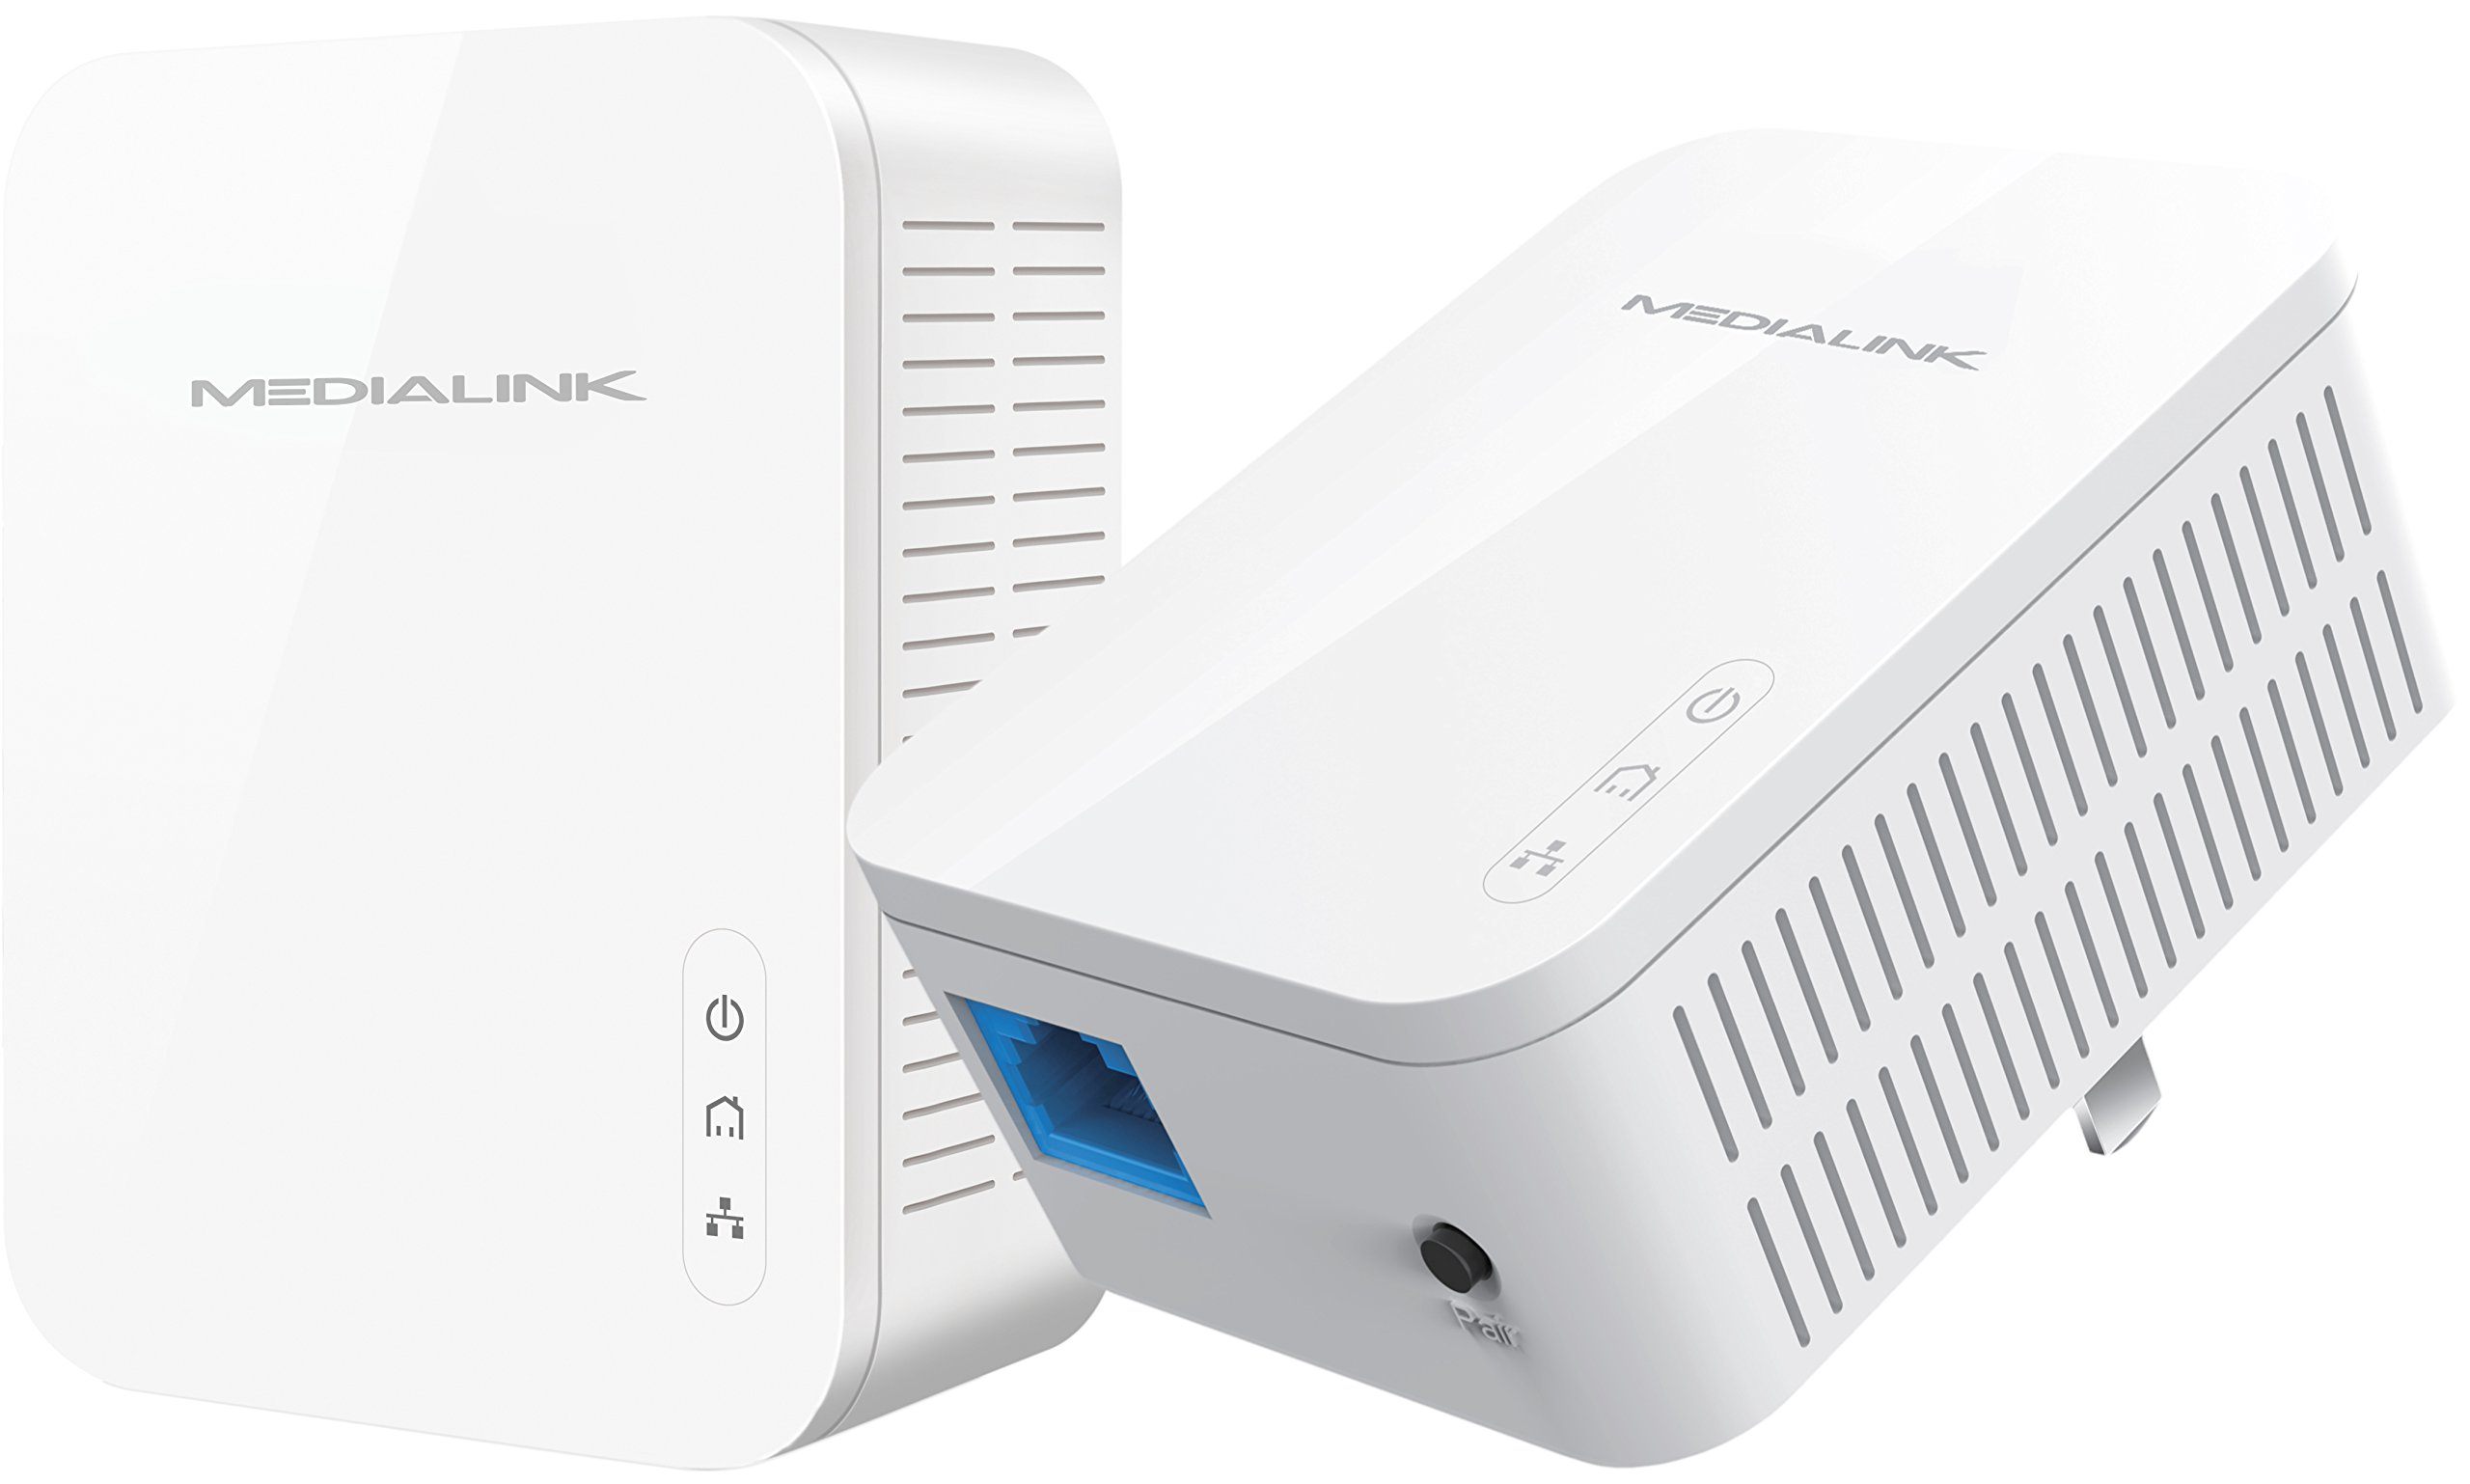 Medialink Gigabit Powerline Adapter Kit (2 Units) - Ethernet Homeplug with Gigabit (1000 Mbps) Wired Speed (Part# MPLA-1000X2) by Mediabridge (Image #1)